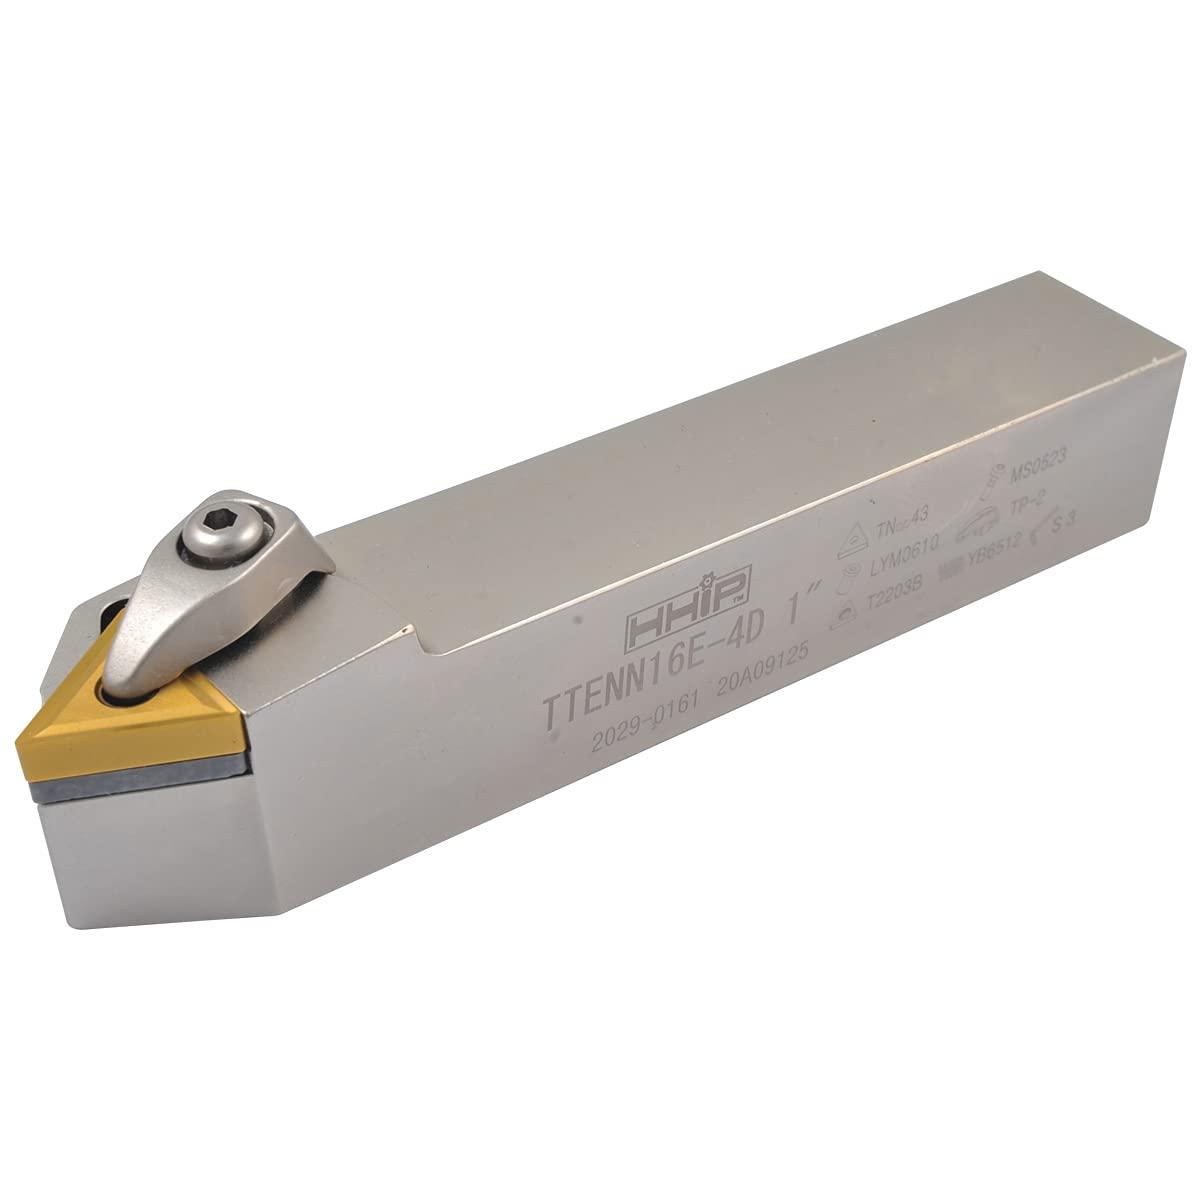 Max 83% OFF HHIP 2029-0161 MTENN 16E-4D Overseas parallel import regular item Turning Tool Clamp New Rigid Holder